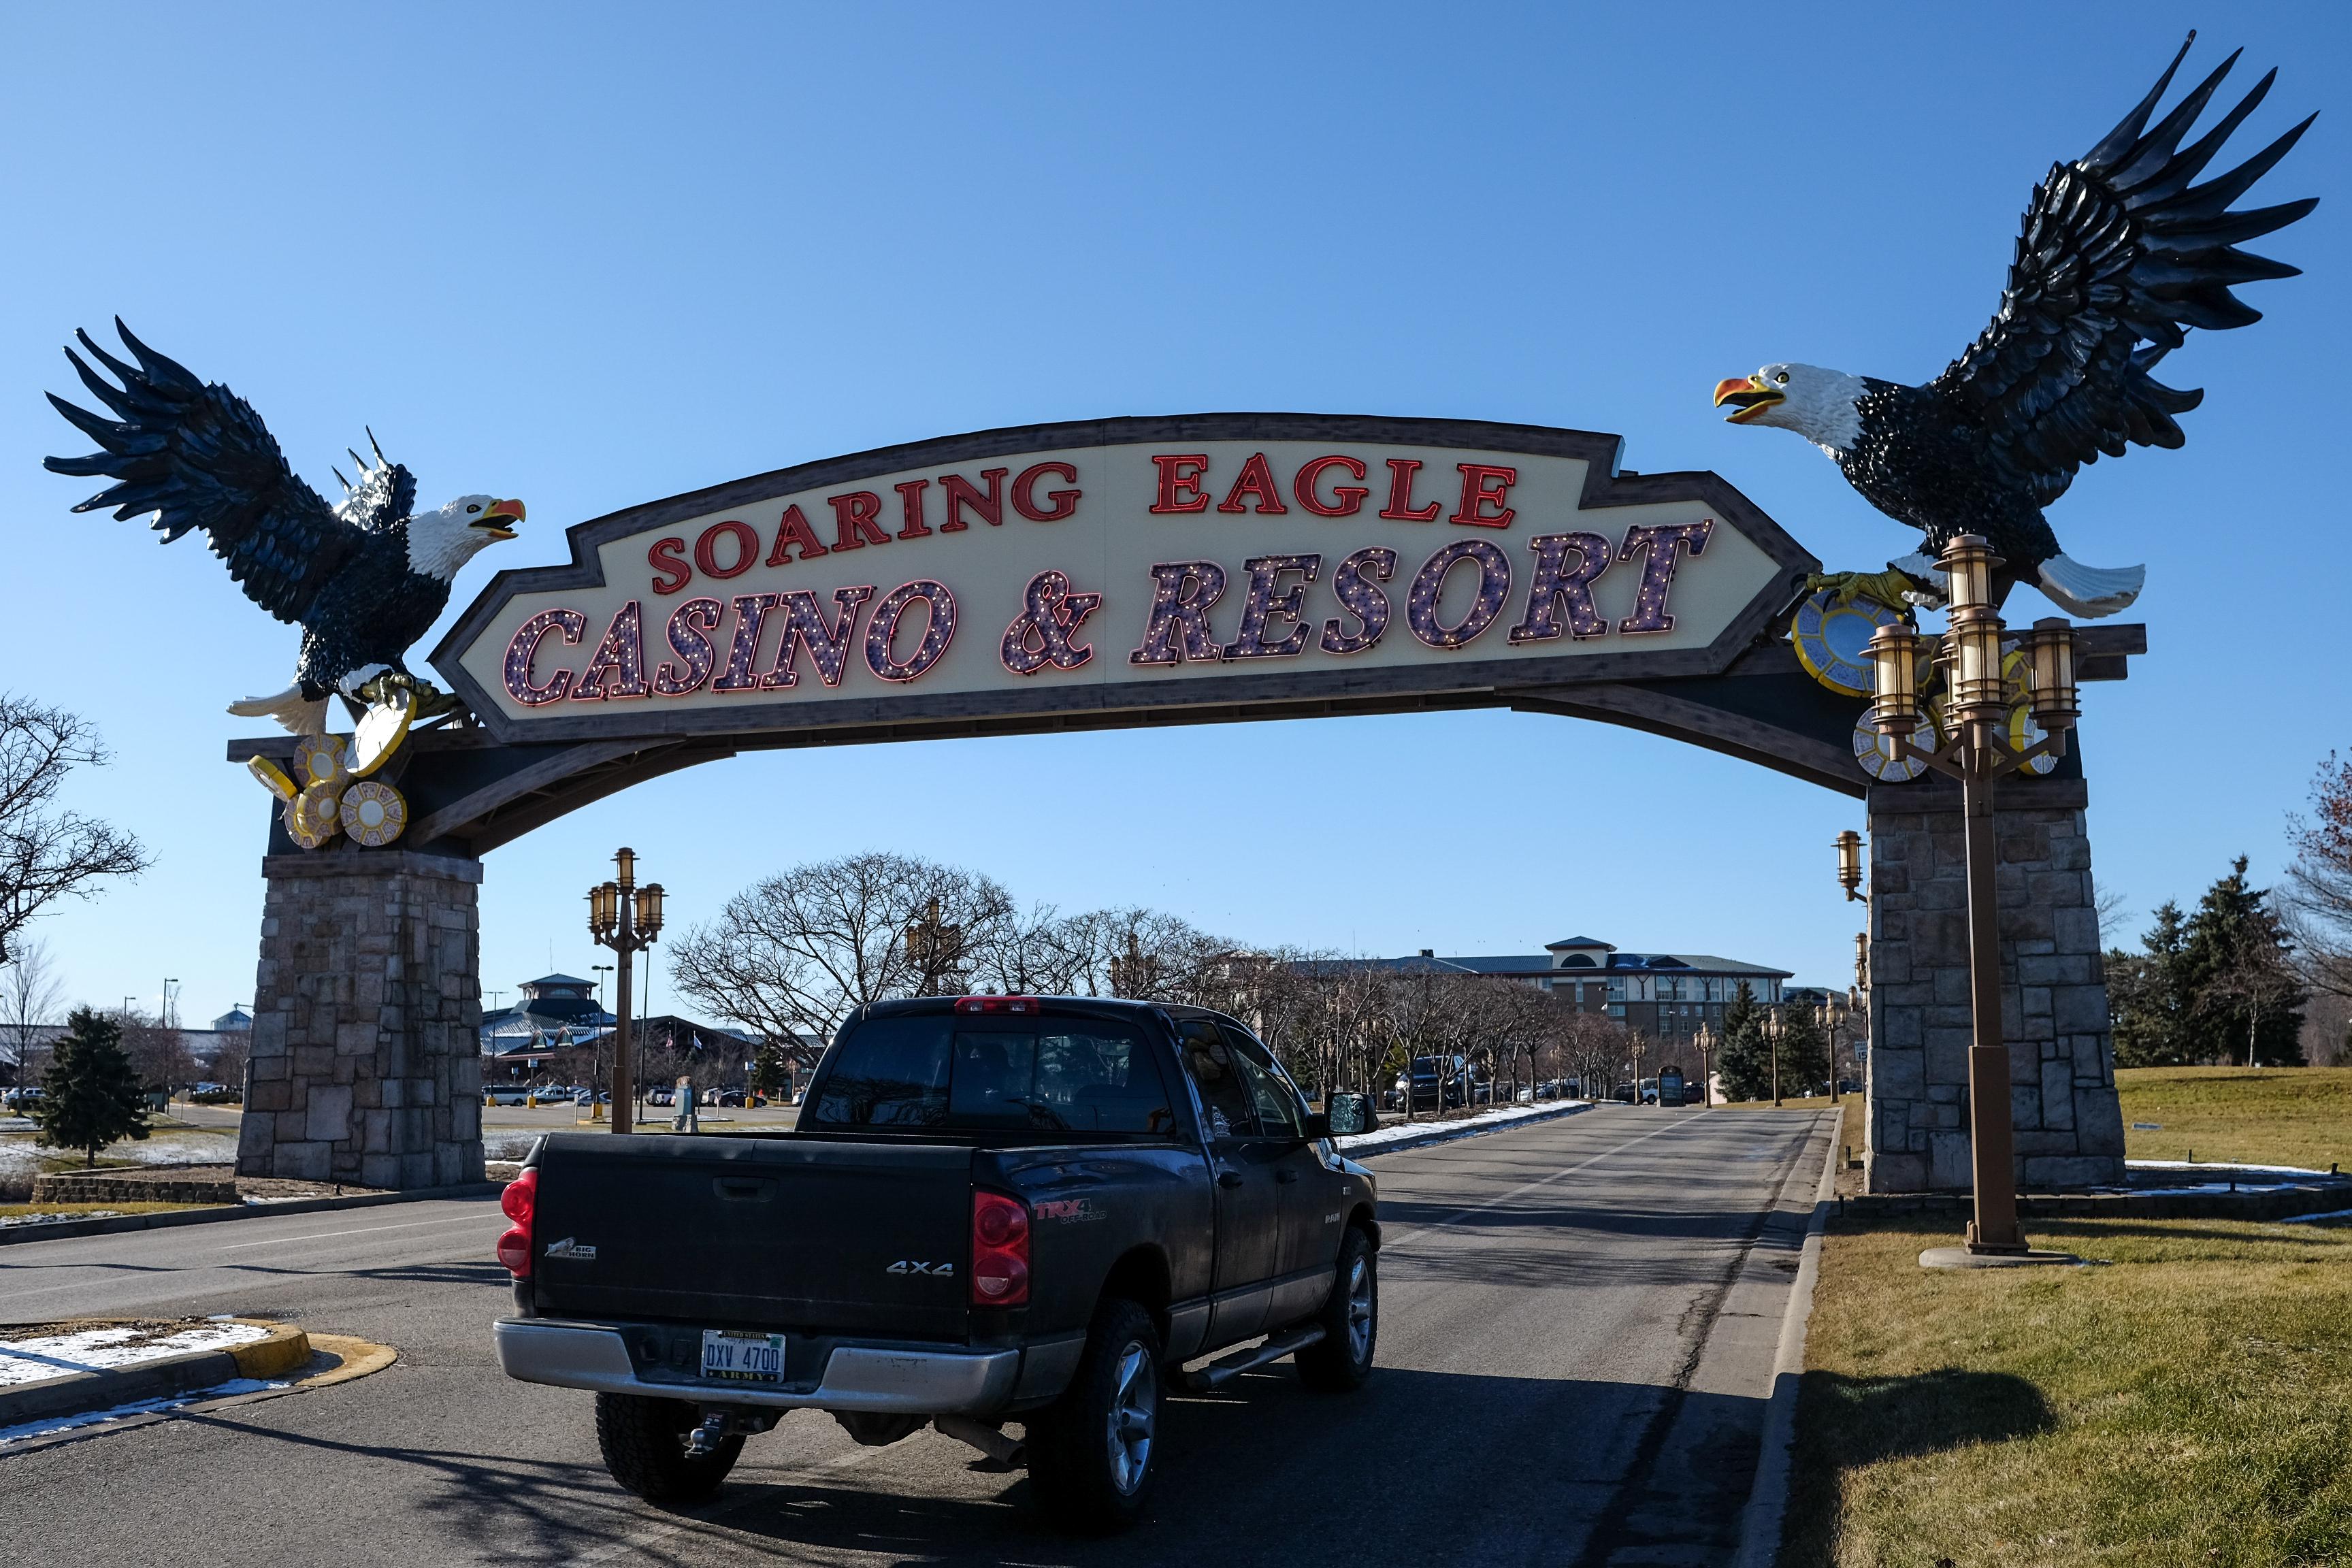 soaring eagle casino news